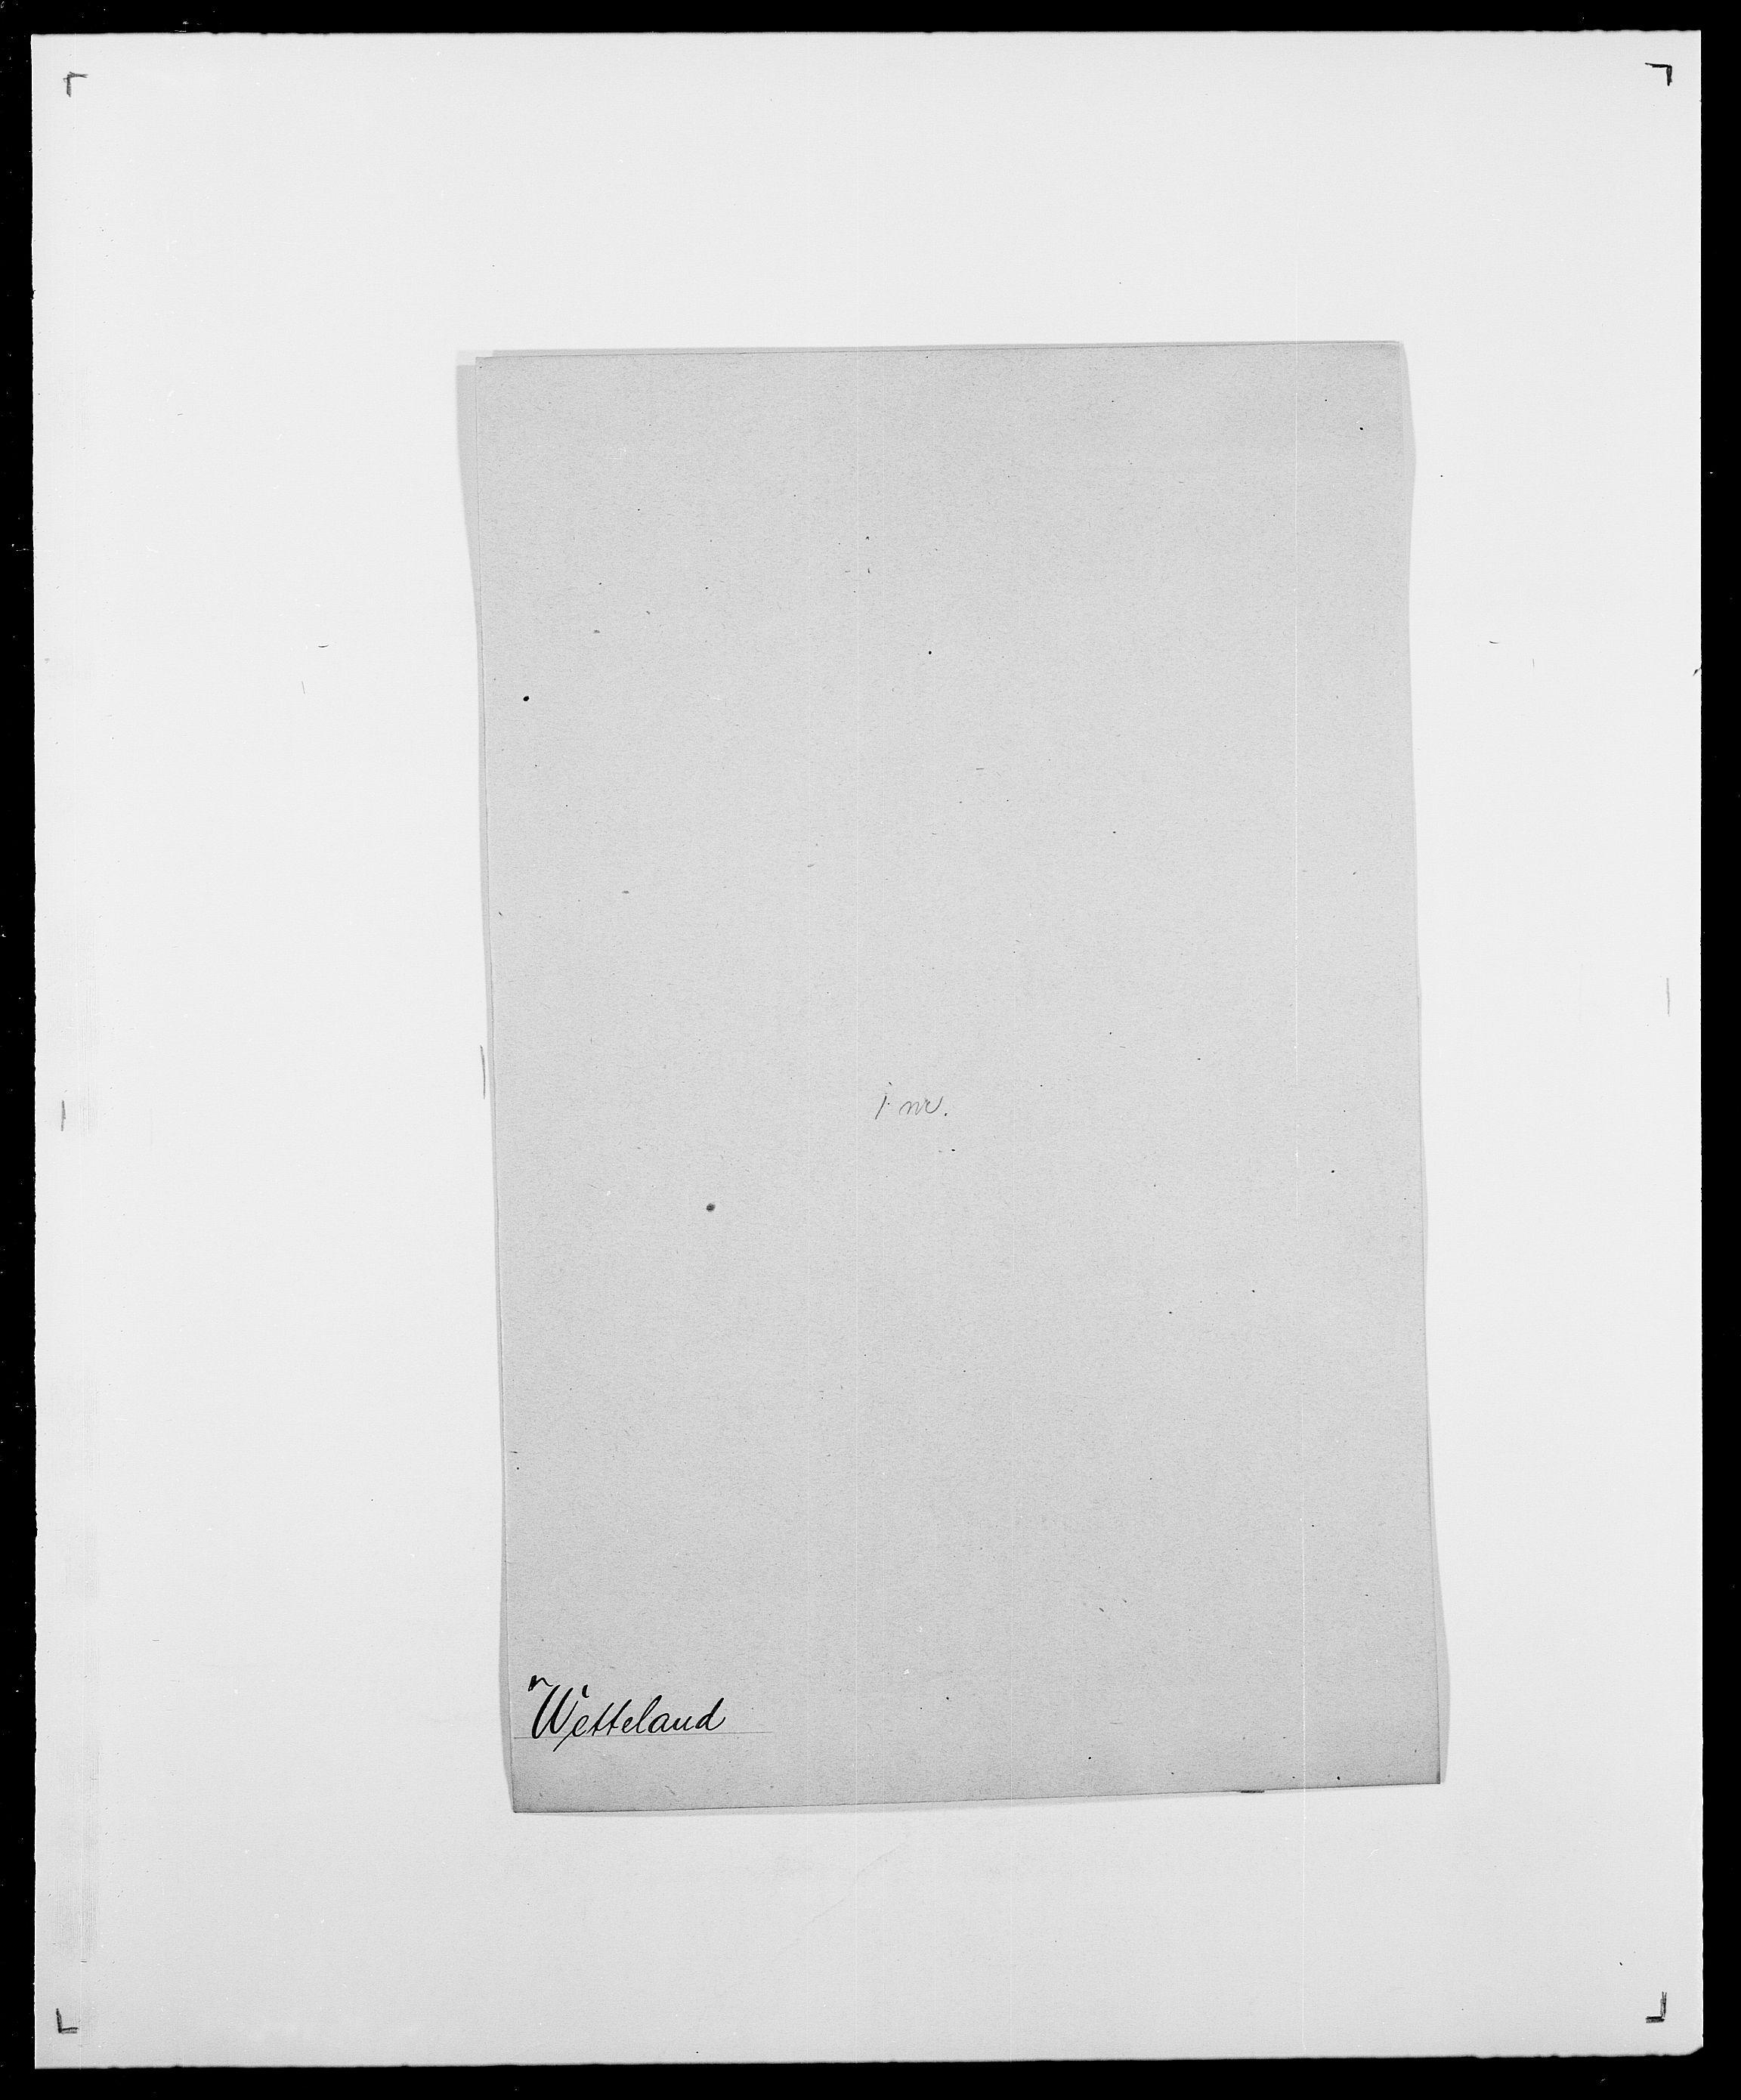 SAO, Delgobe, Charles Antoine - samling, D/Da/L0041: Vemmestad - Viker, s. 343